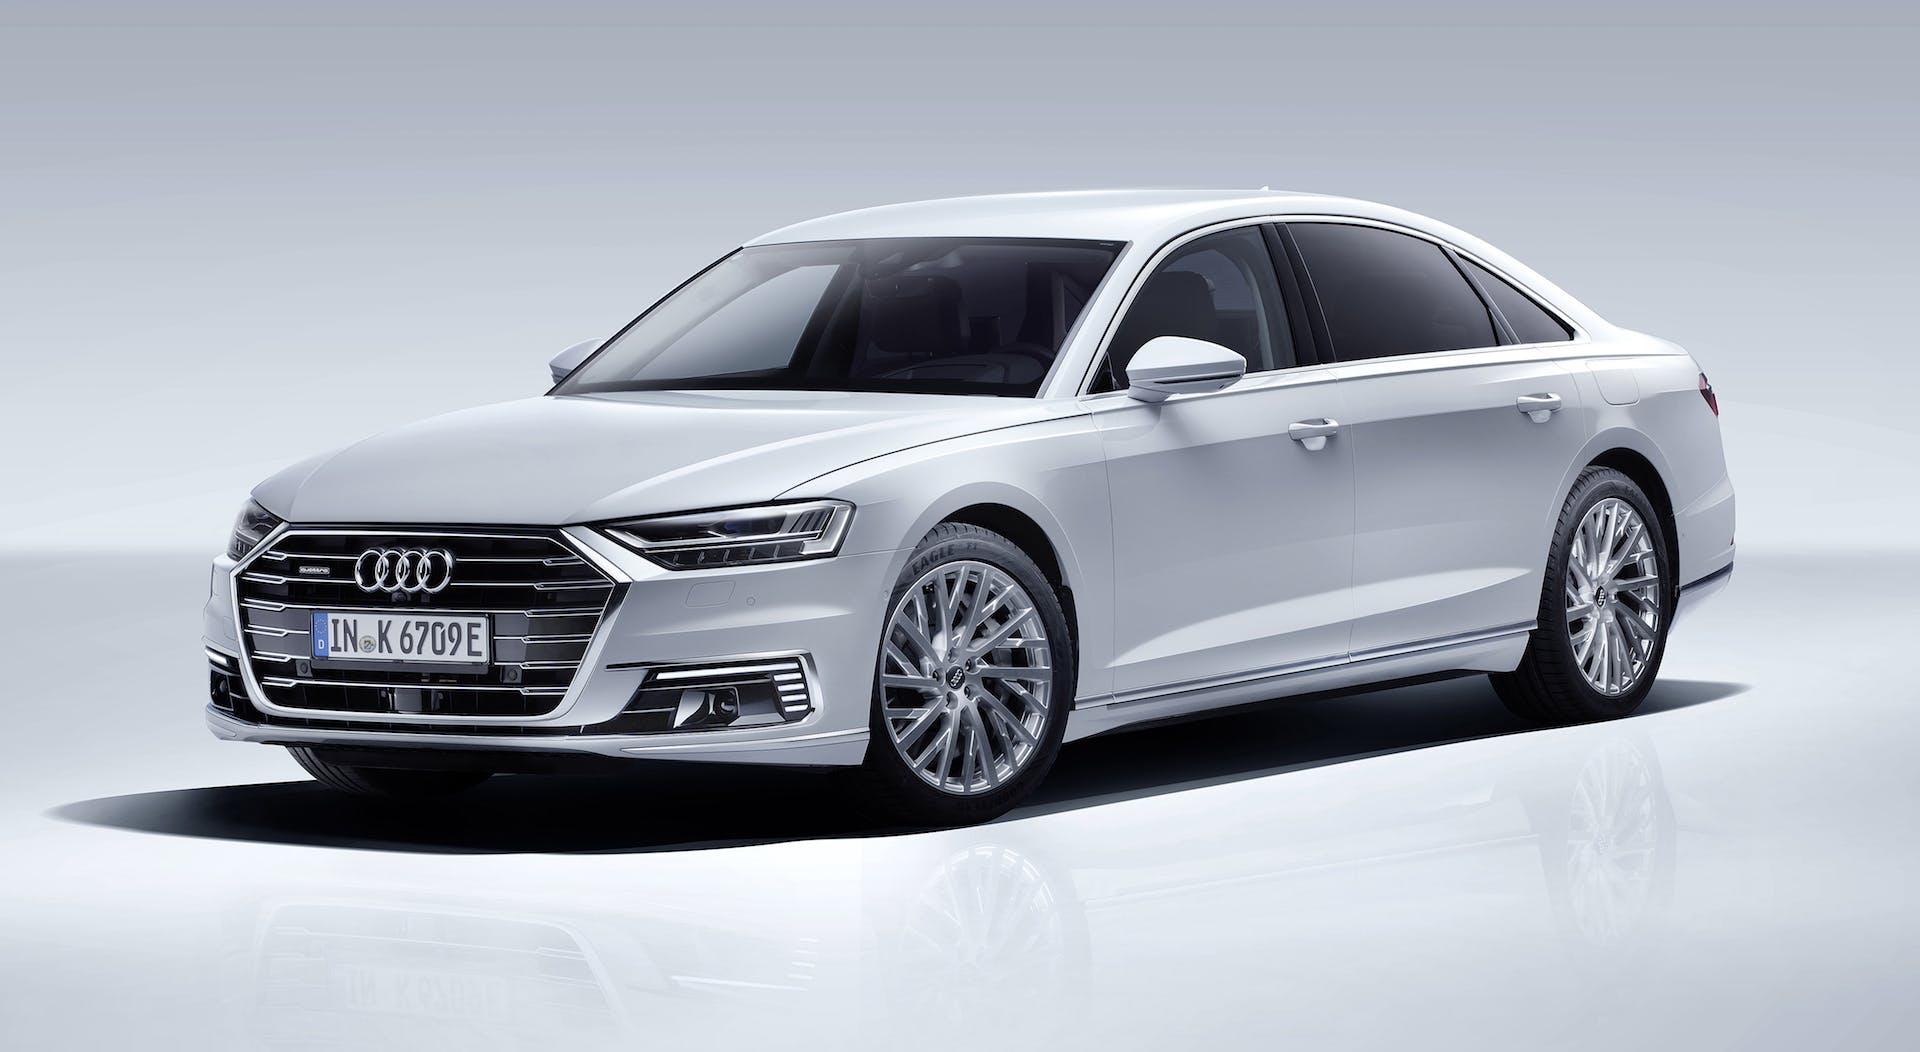 Audi A8 L plug-in hybrid 2019 bianco